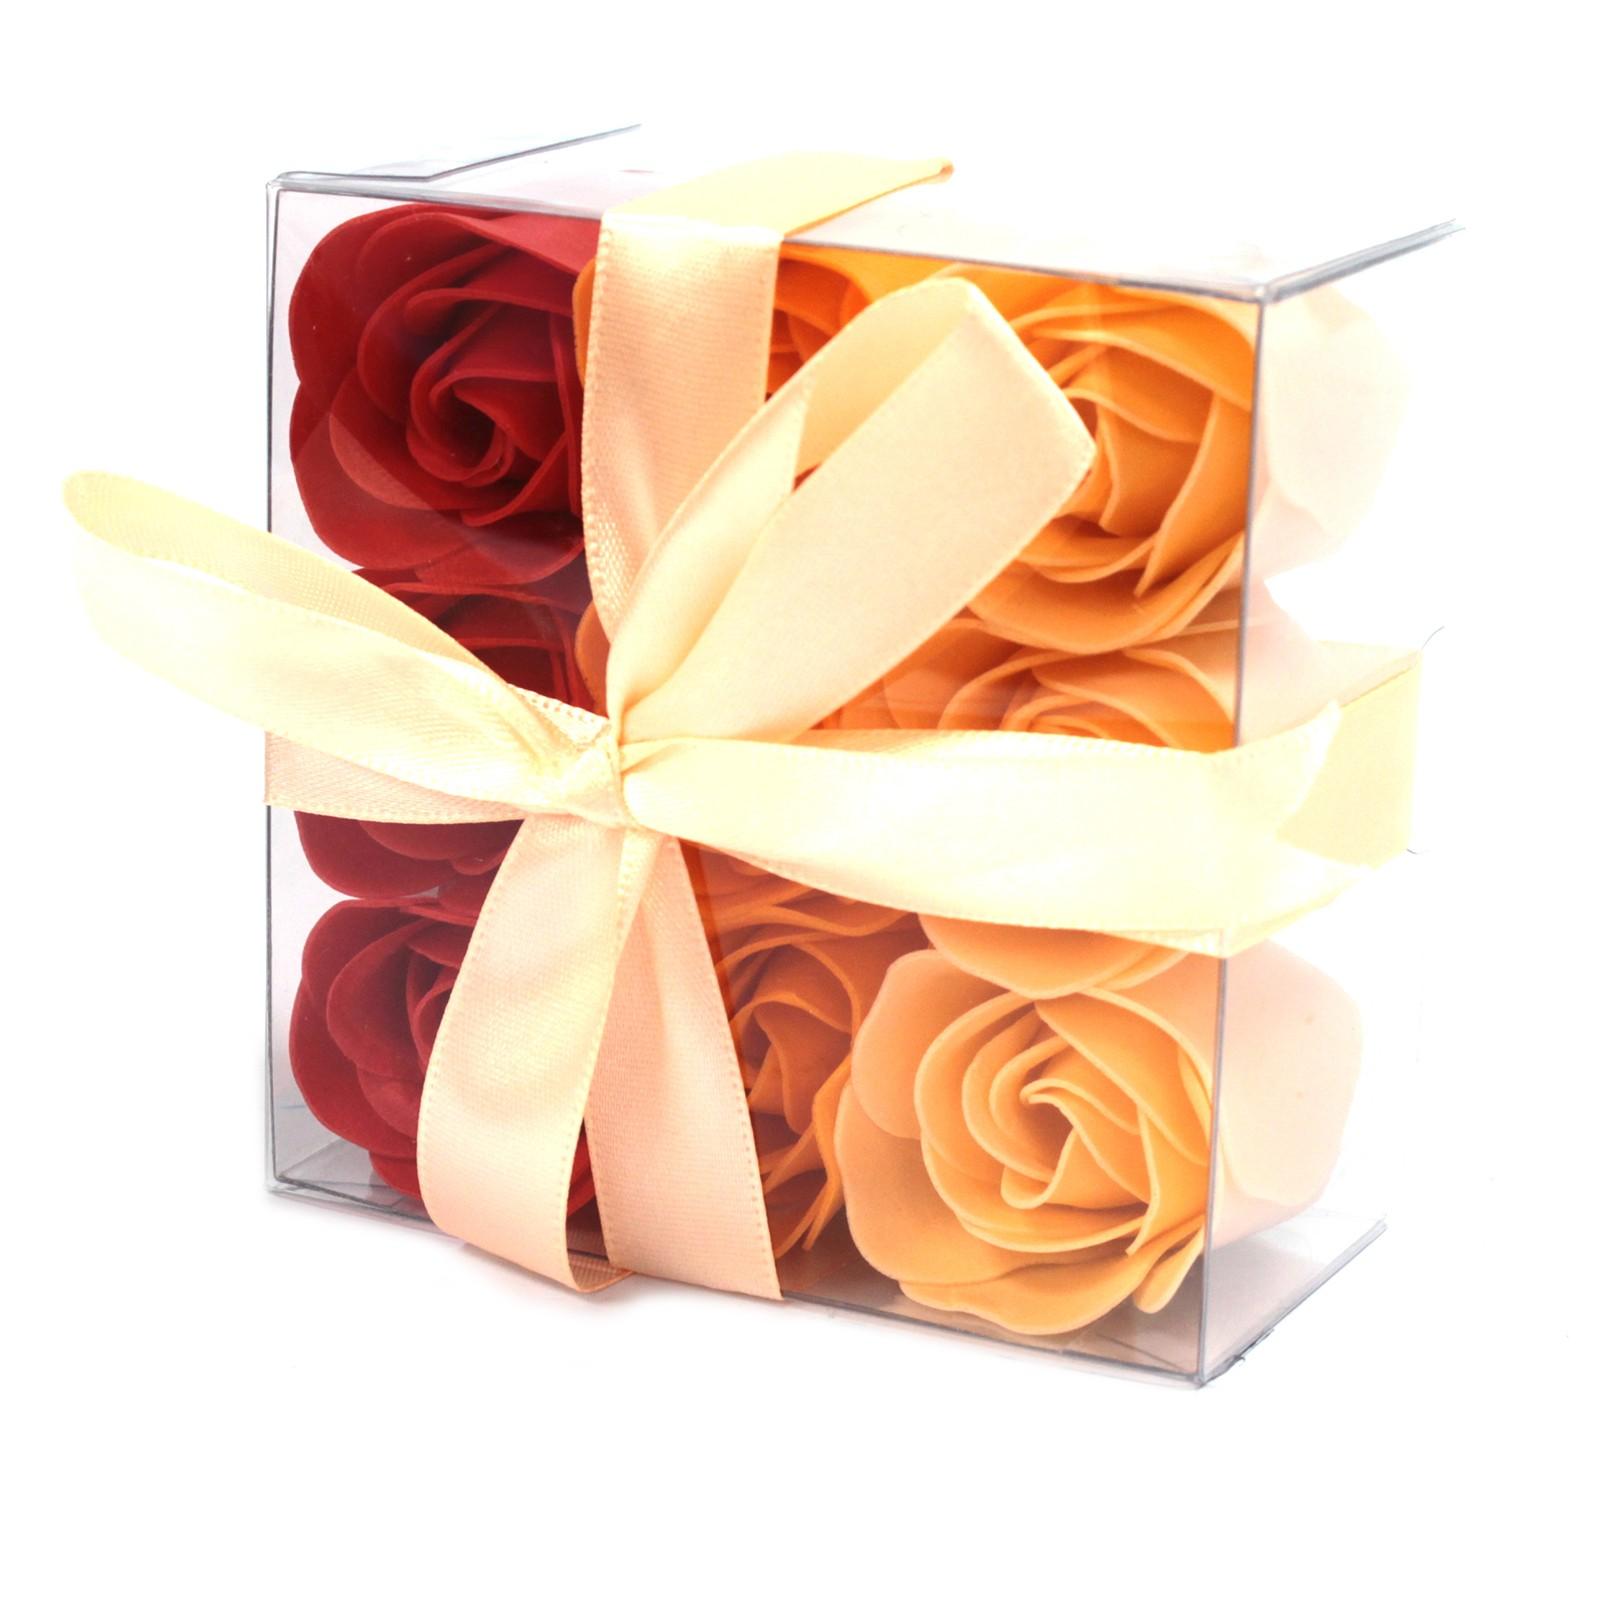 Set of 9 Soap Flower Box Peach Roses